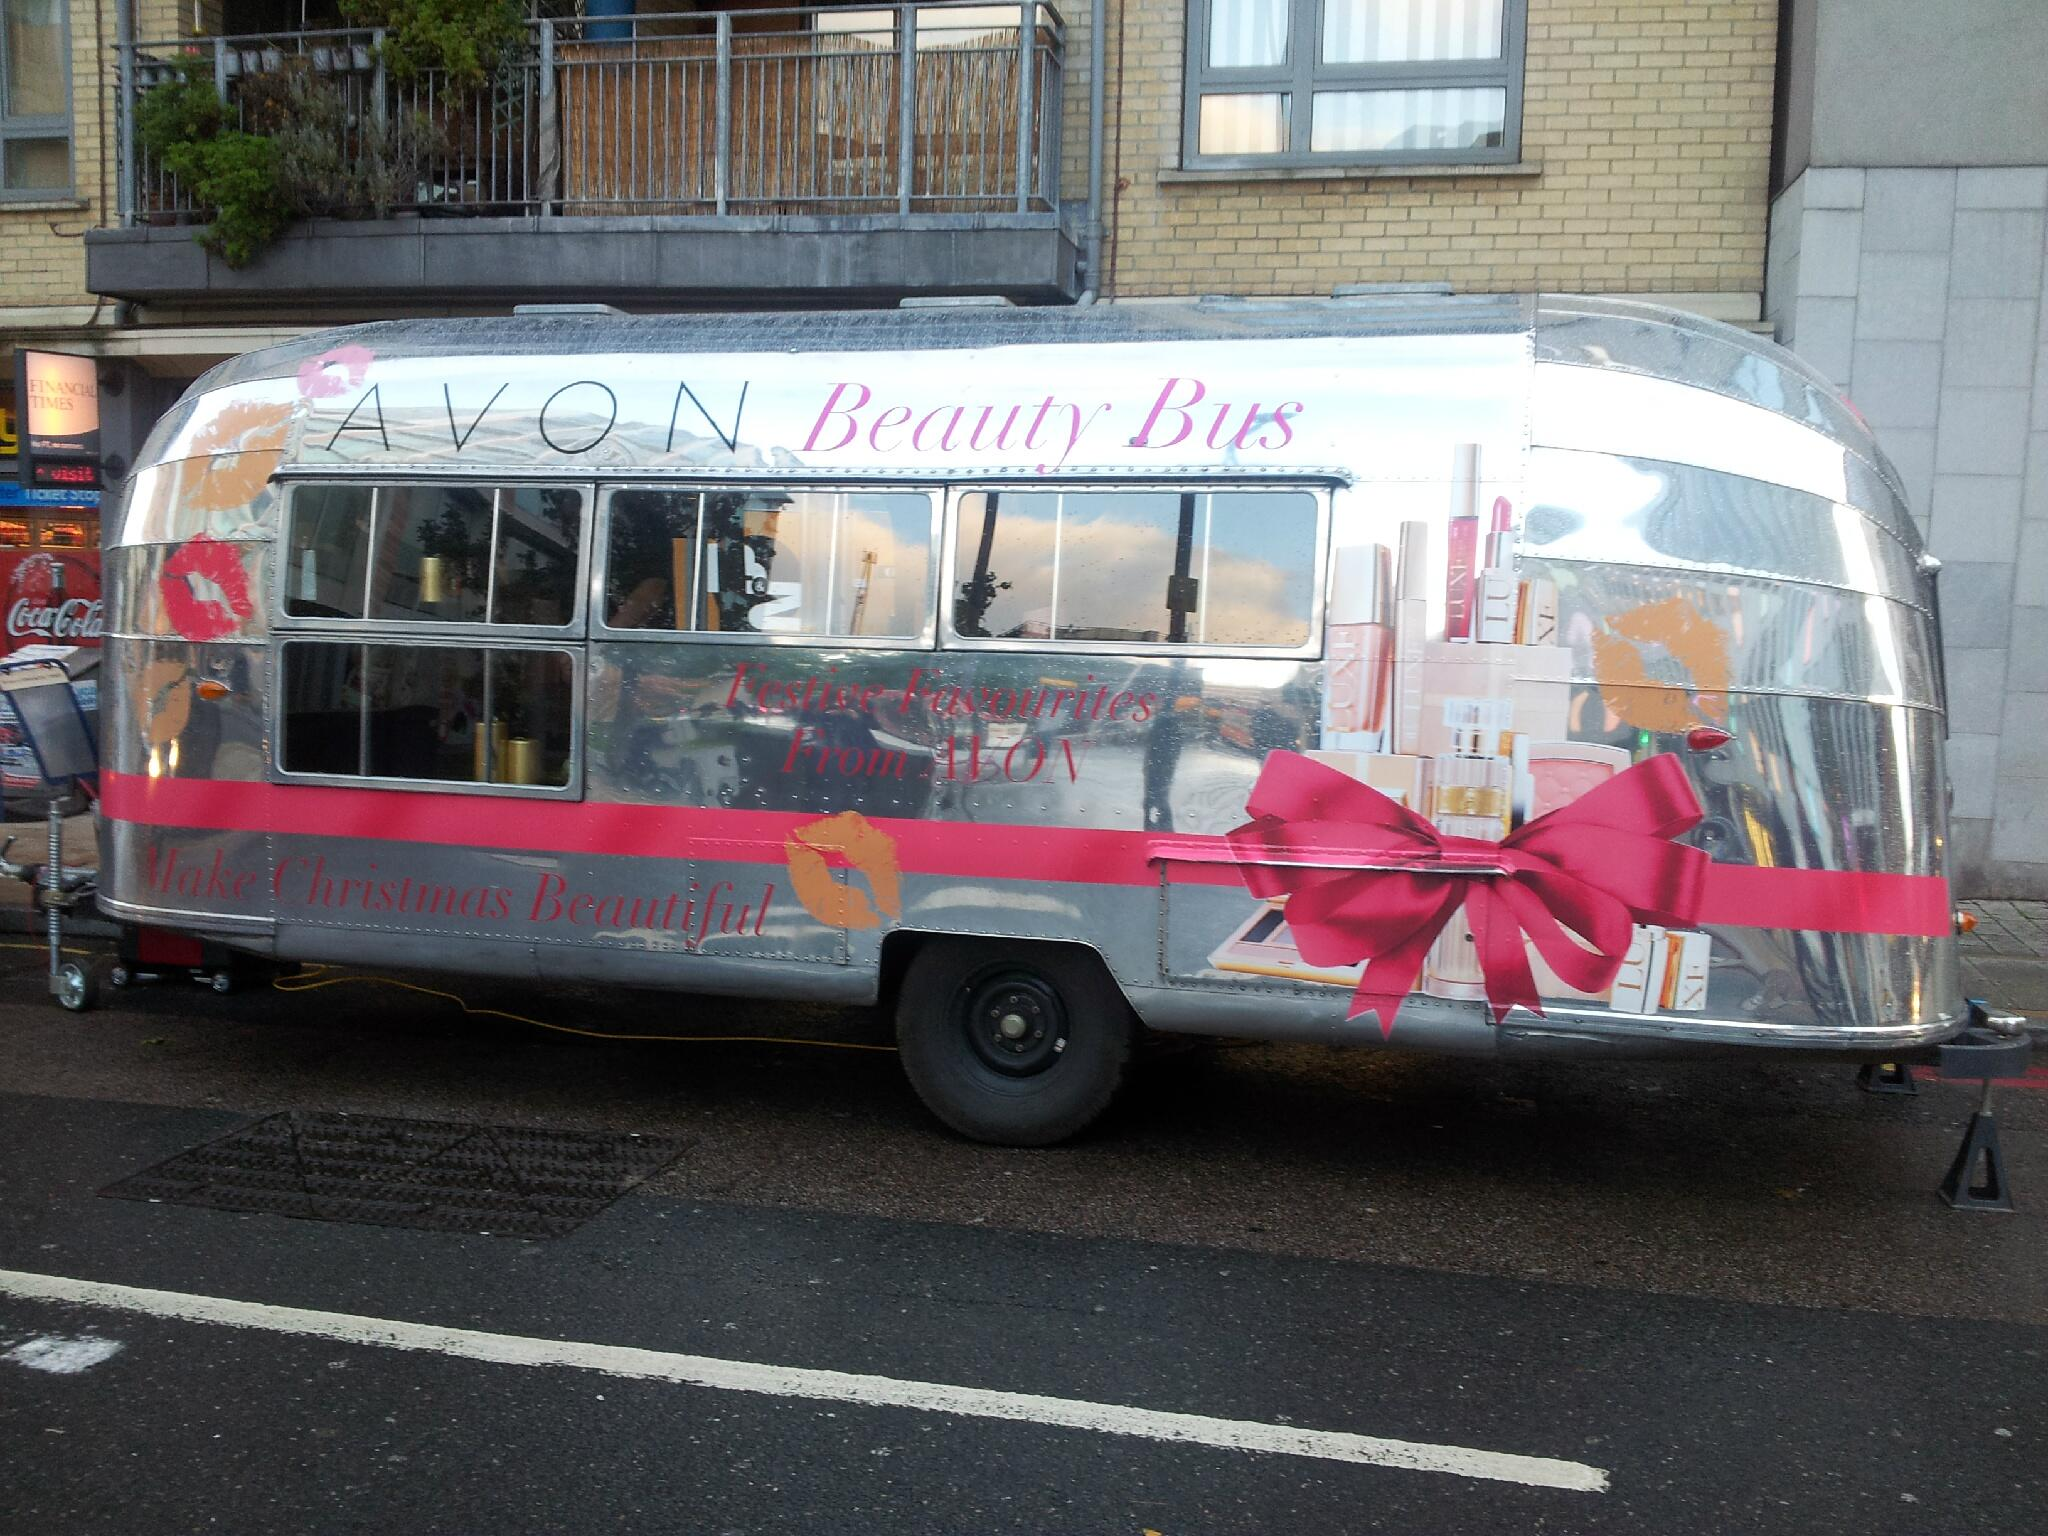 RT @AvonPRCalling: The PR Beauty Bus is ready for its first guests! @Avon_UK @halpernpr #AvonBeautyBus http://t.co/SFRTzDlWKB